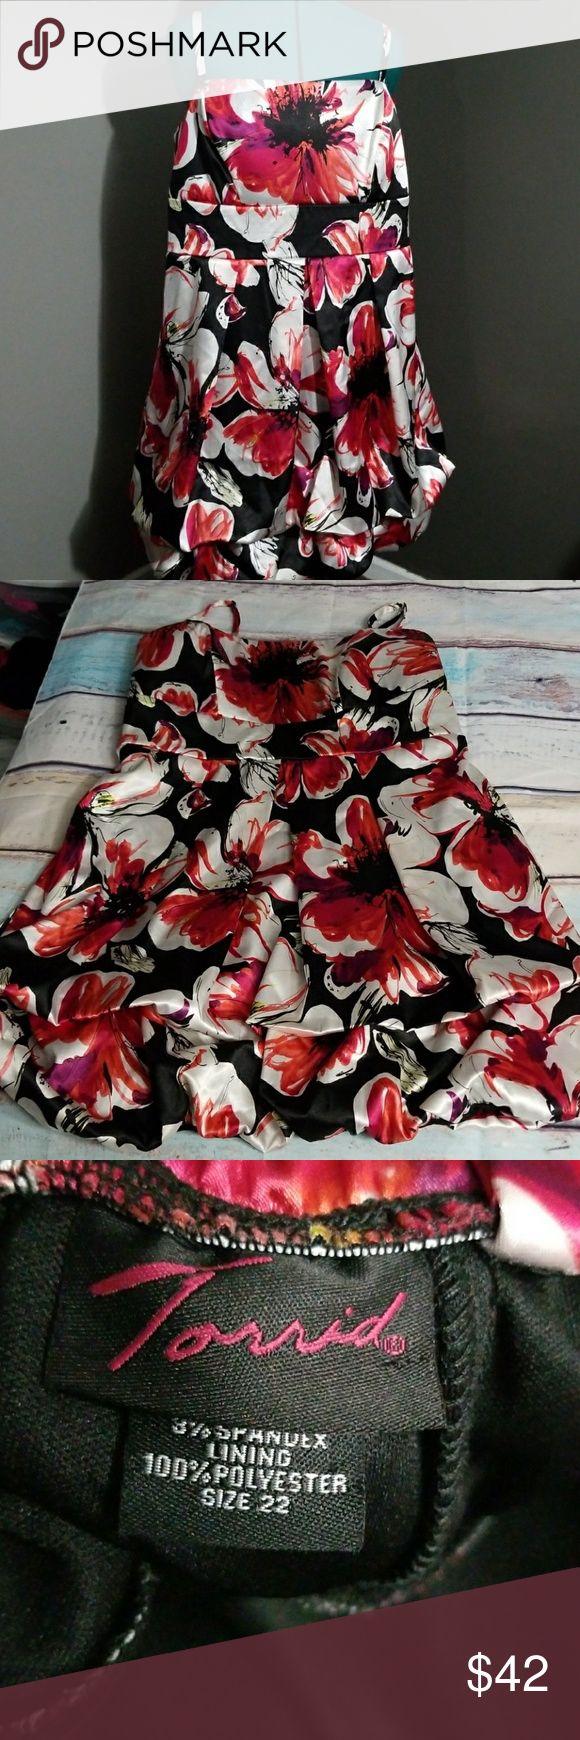 Torrid size 22 dress Size 22 party dress by Torrid. Torrid Dresses